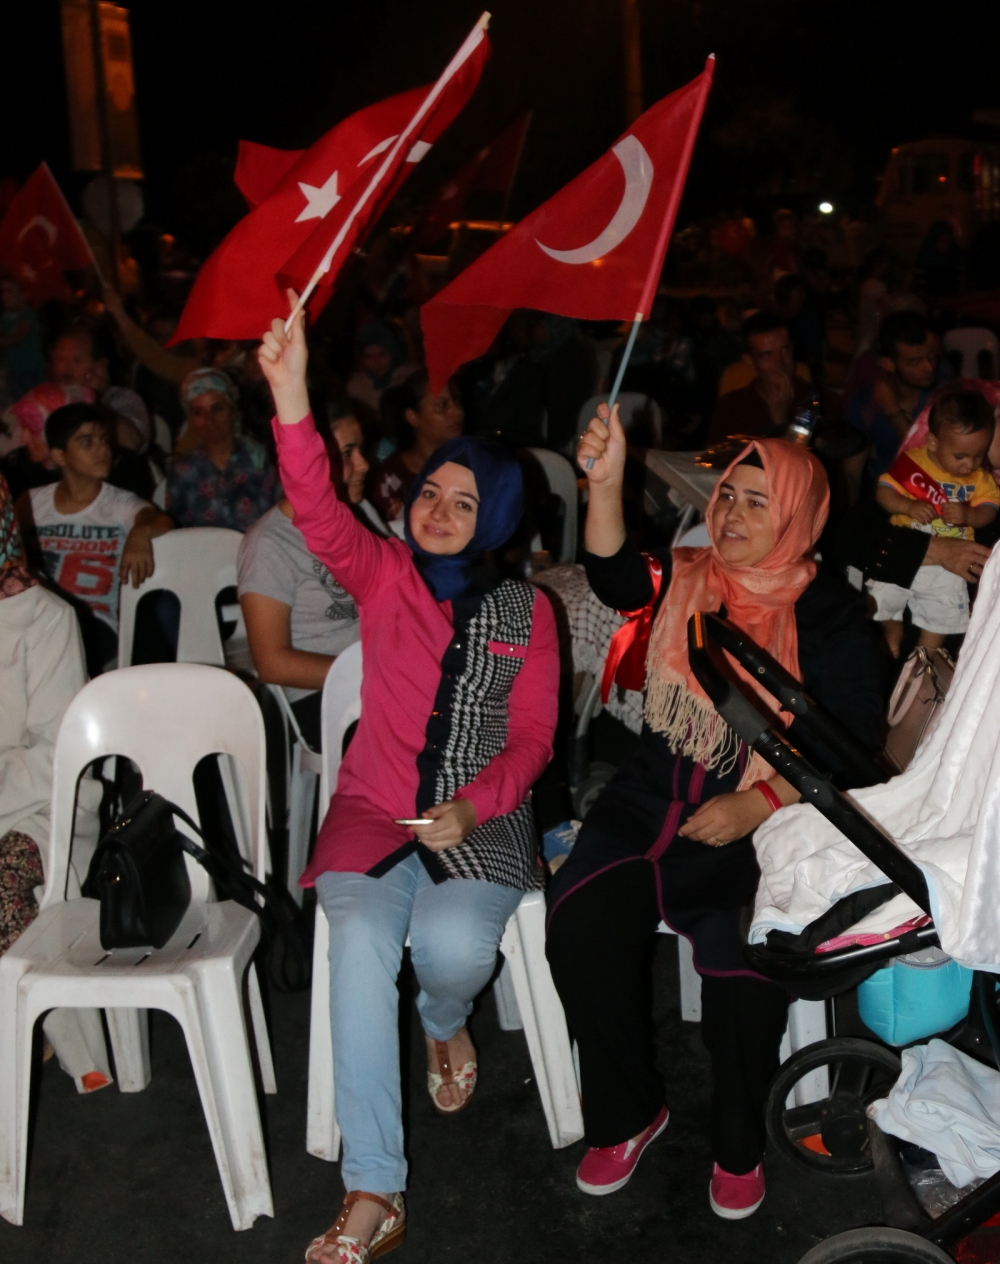 Akhisar demokrasi nöbeti 18. günü 40